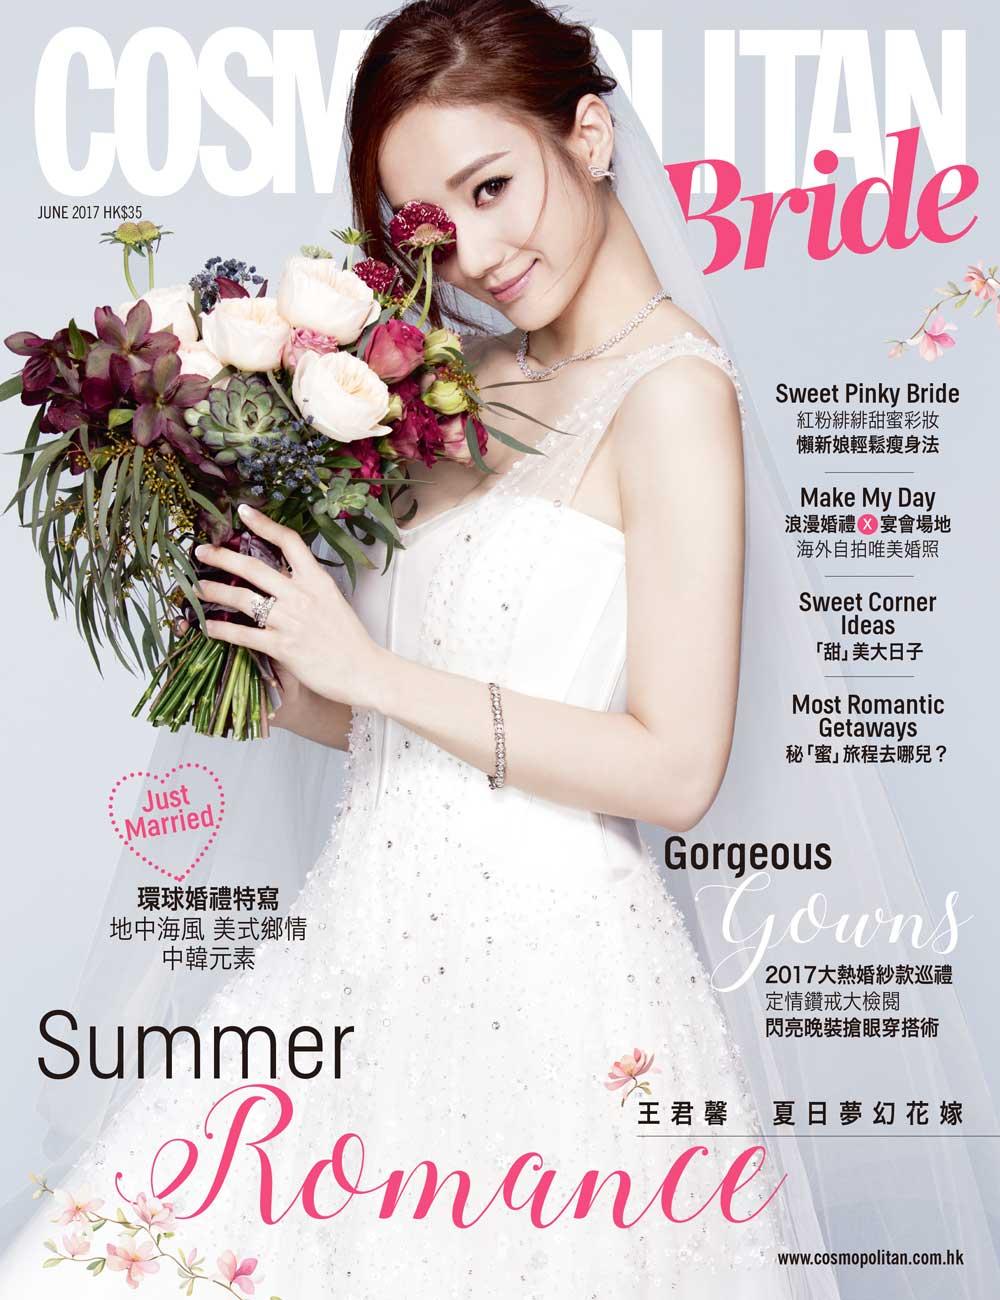 bride17_june_cover (1).jpg